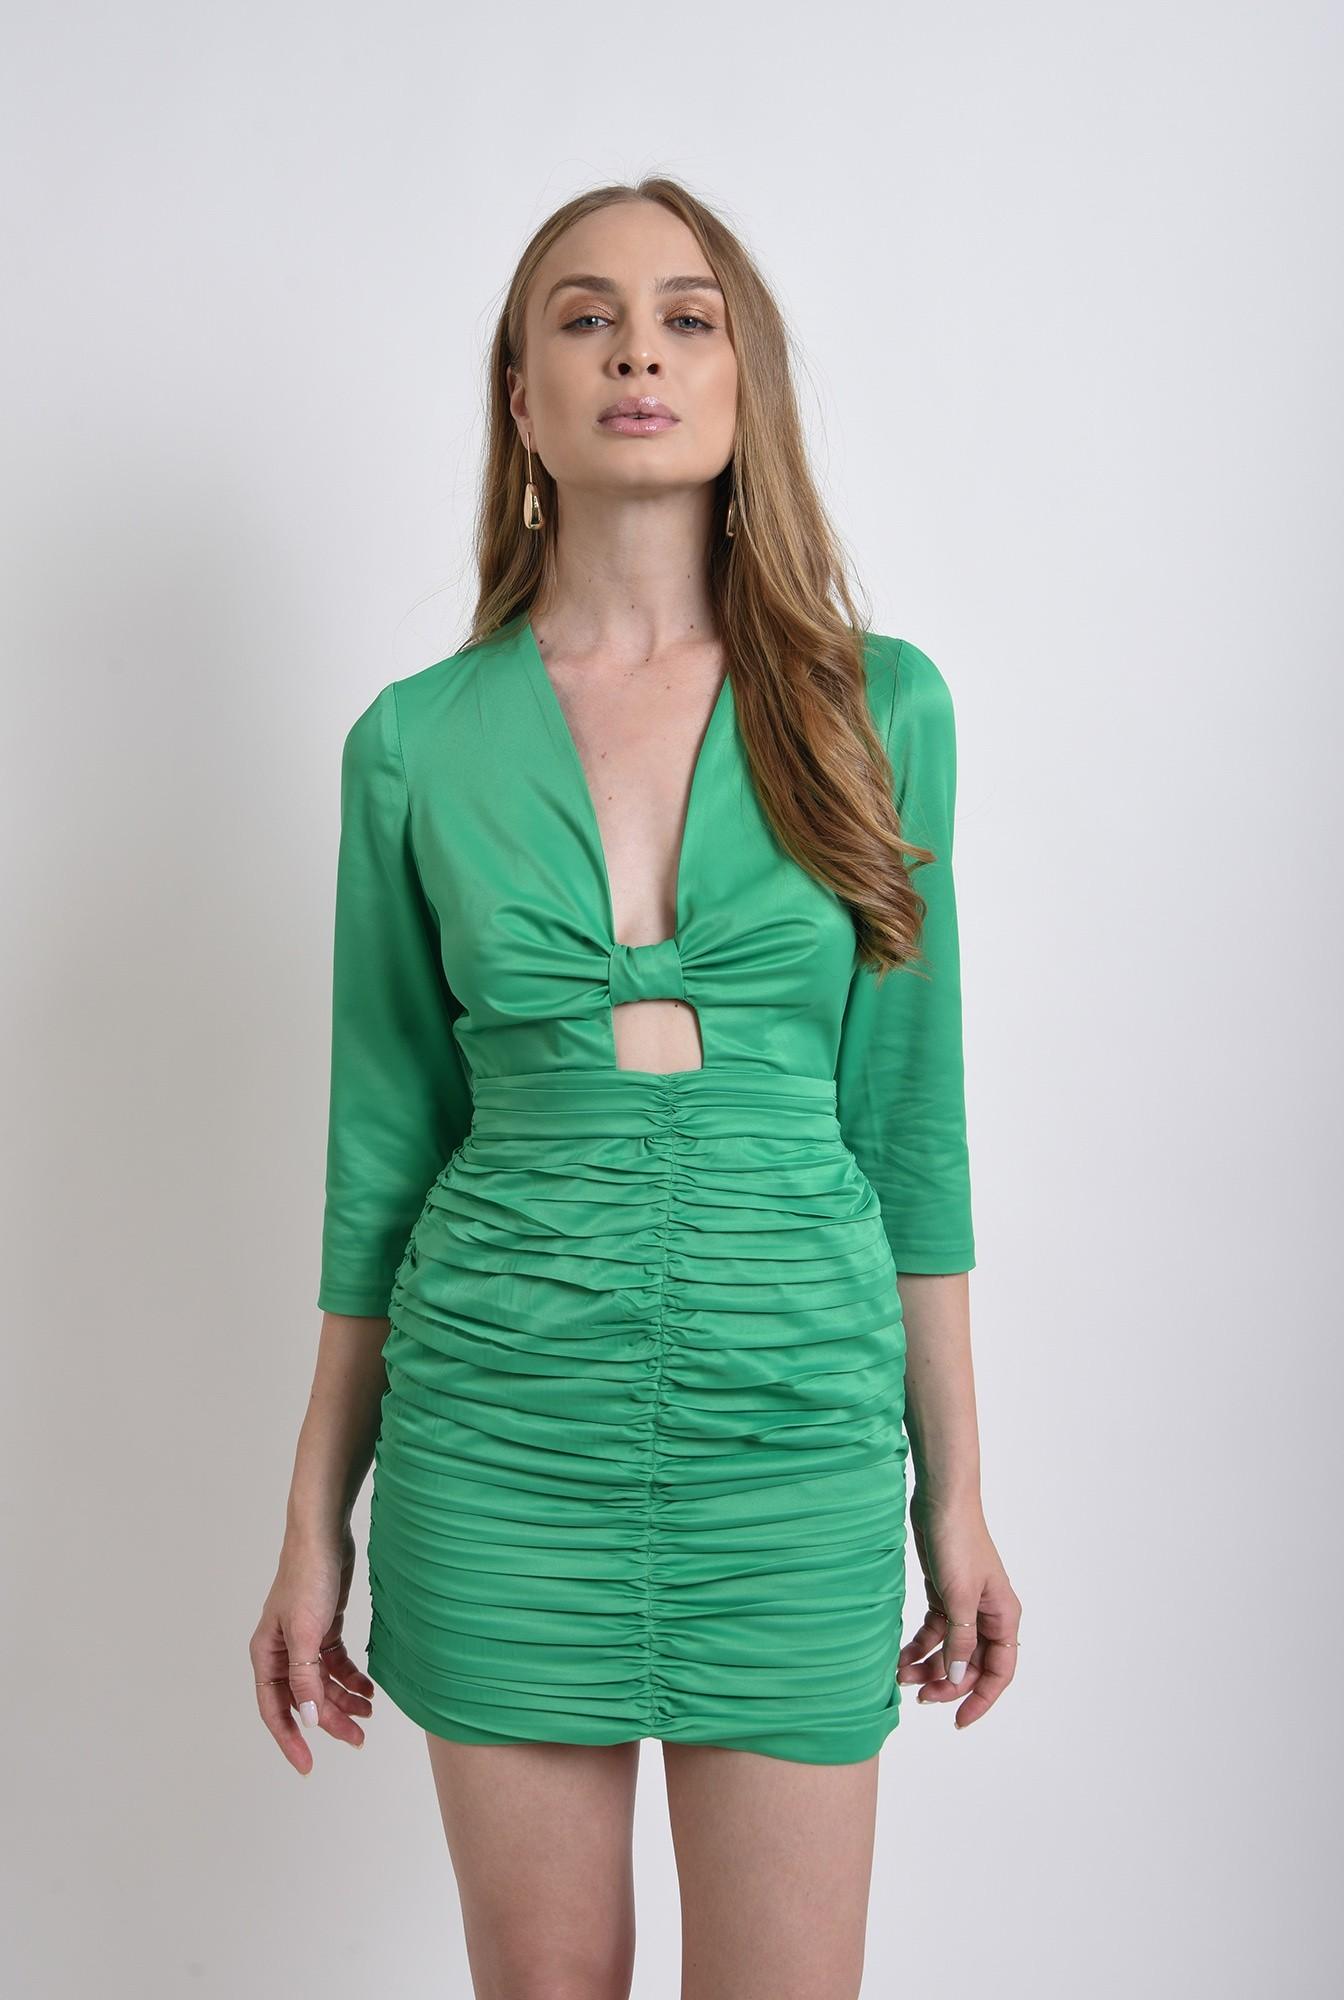 0 - rochie eleganta, mini, verde, Poema